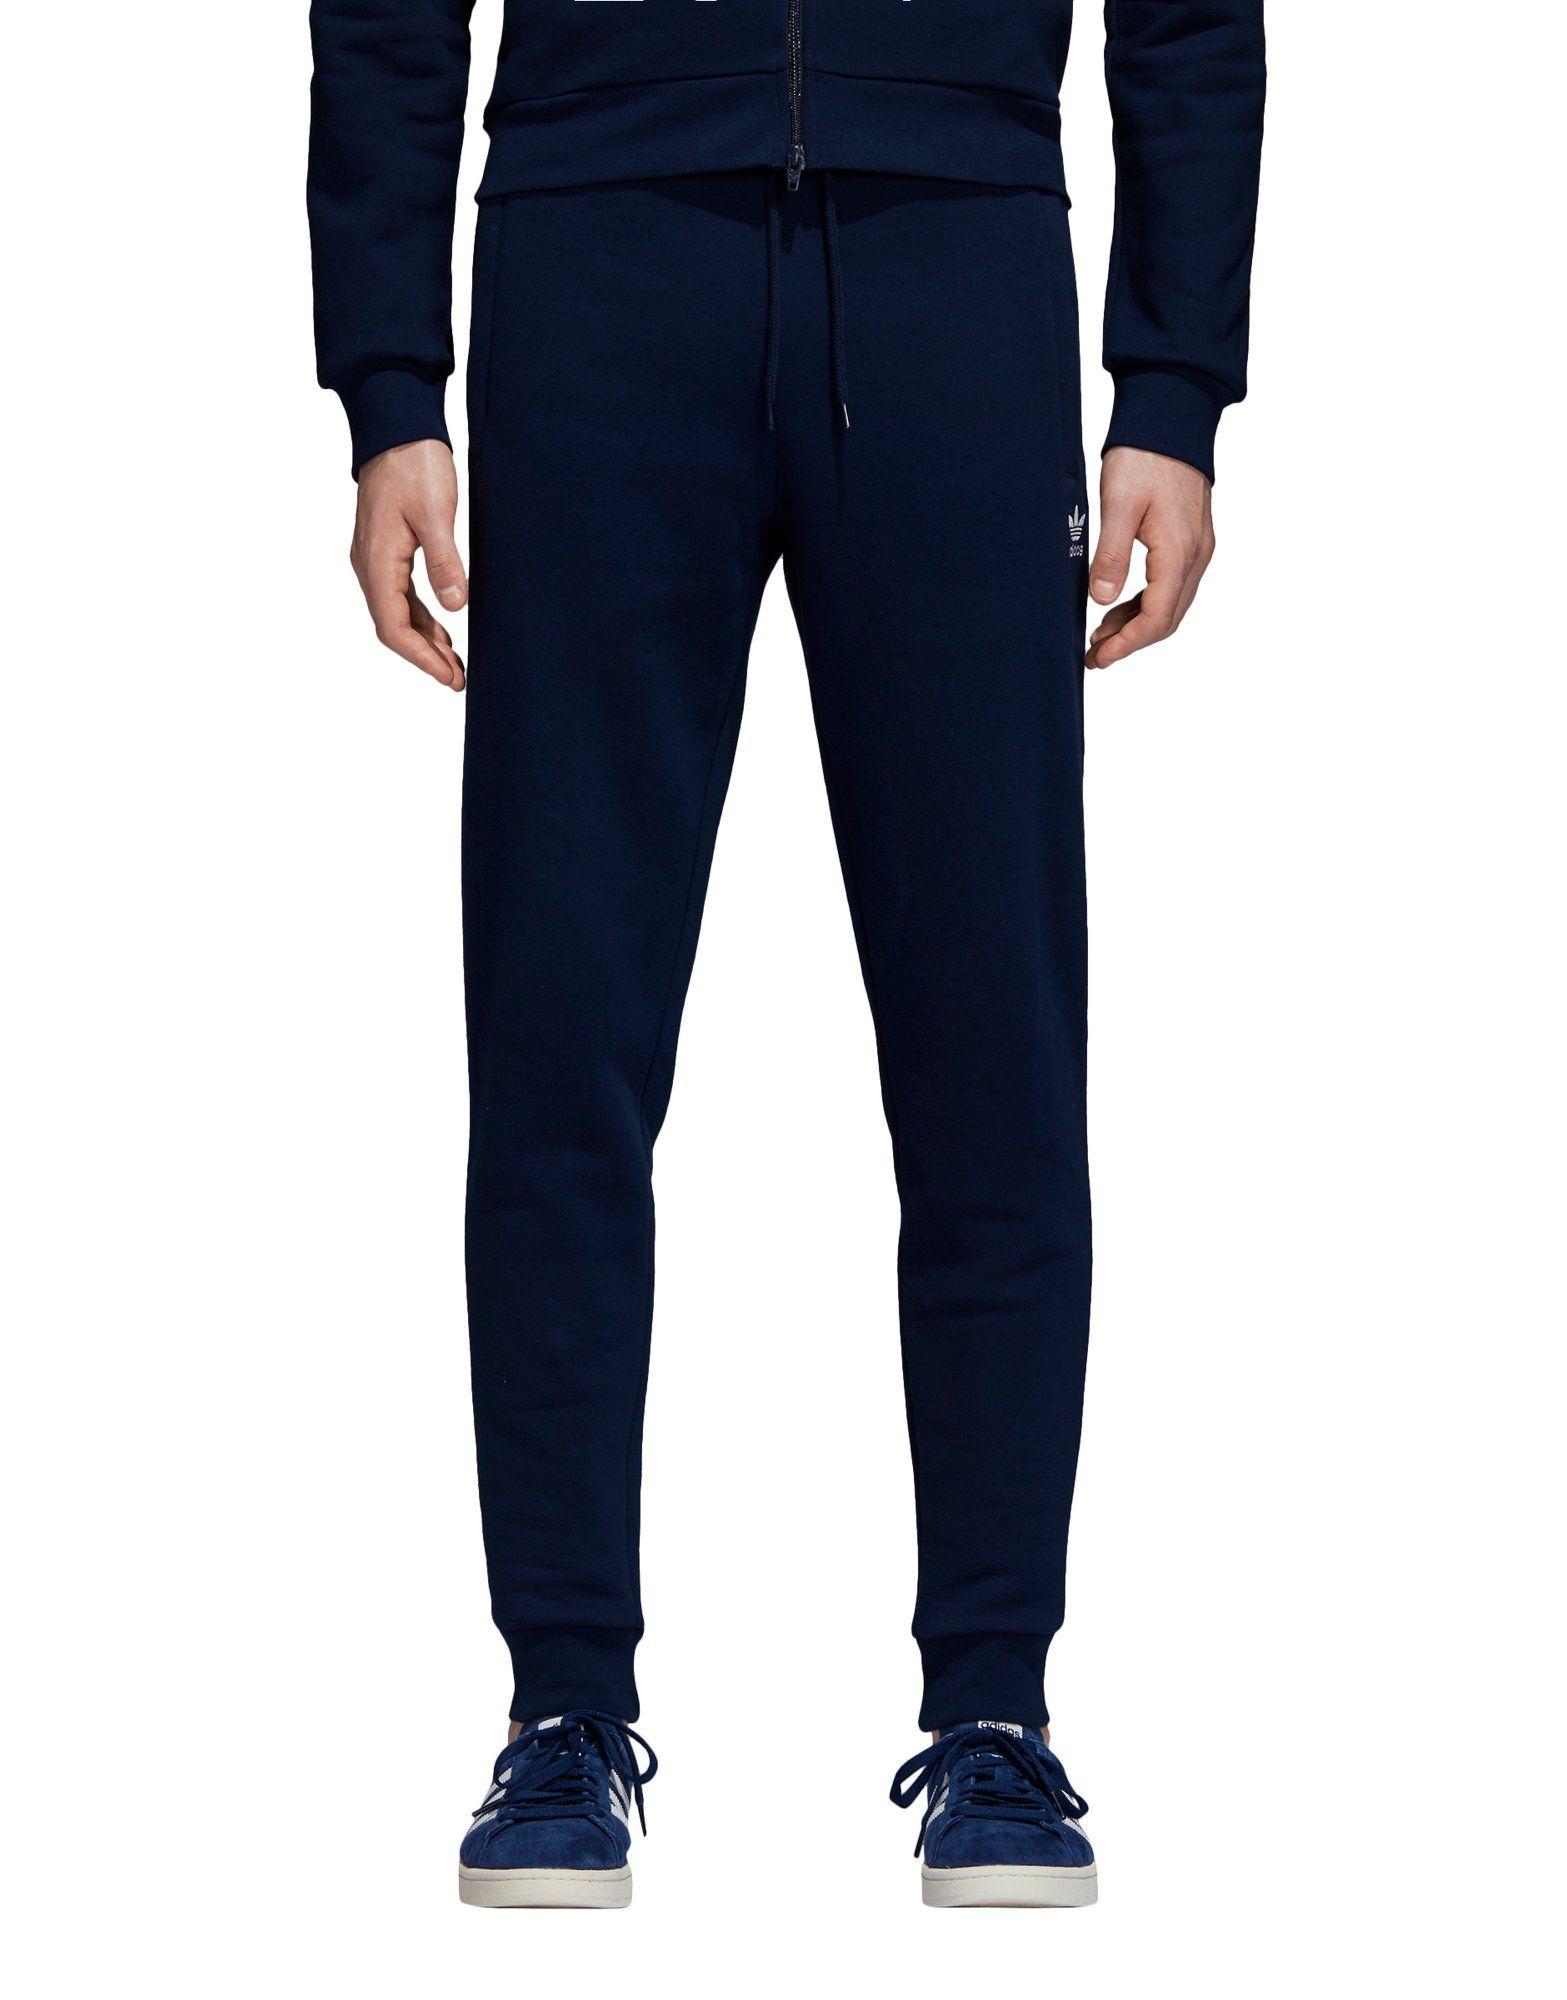 ea2860a12 ADIDAS Fleece Slim Pants | JD Sports